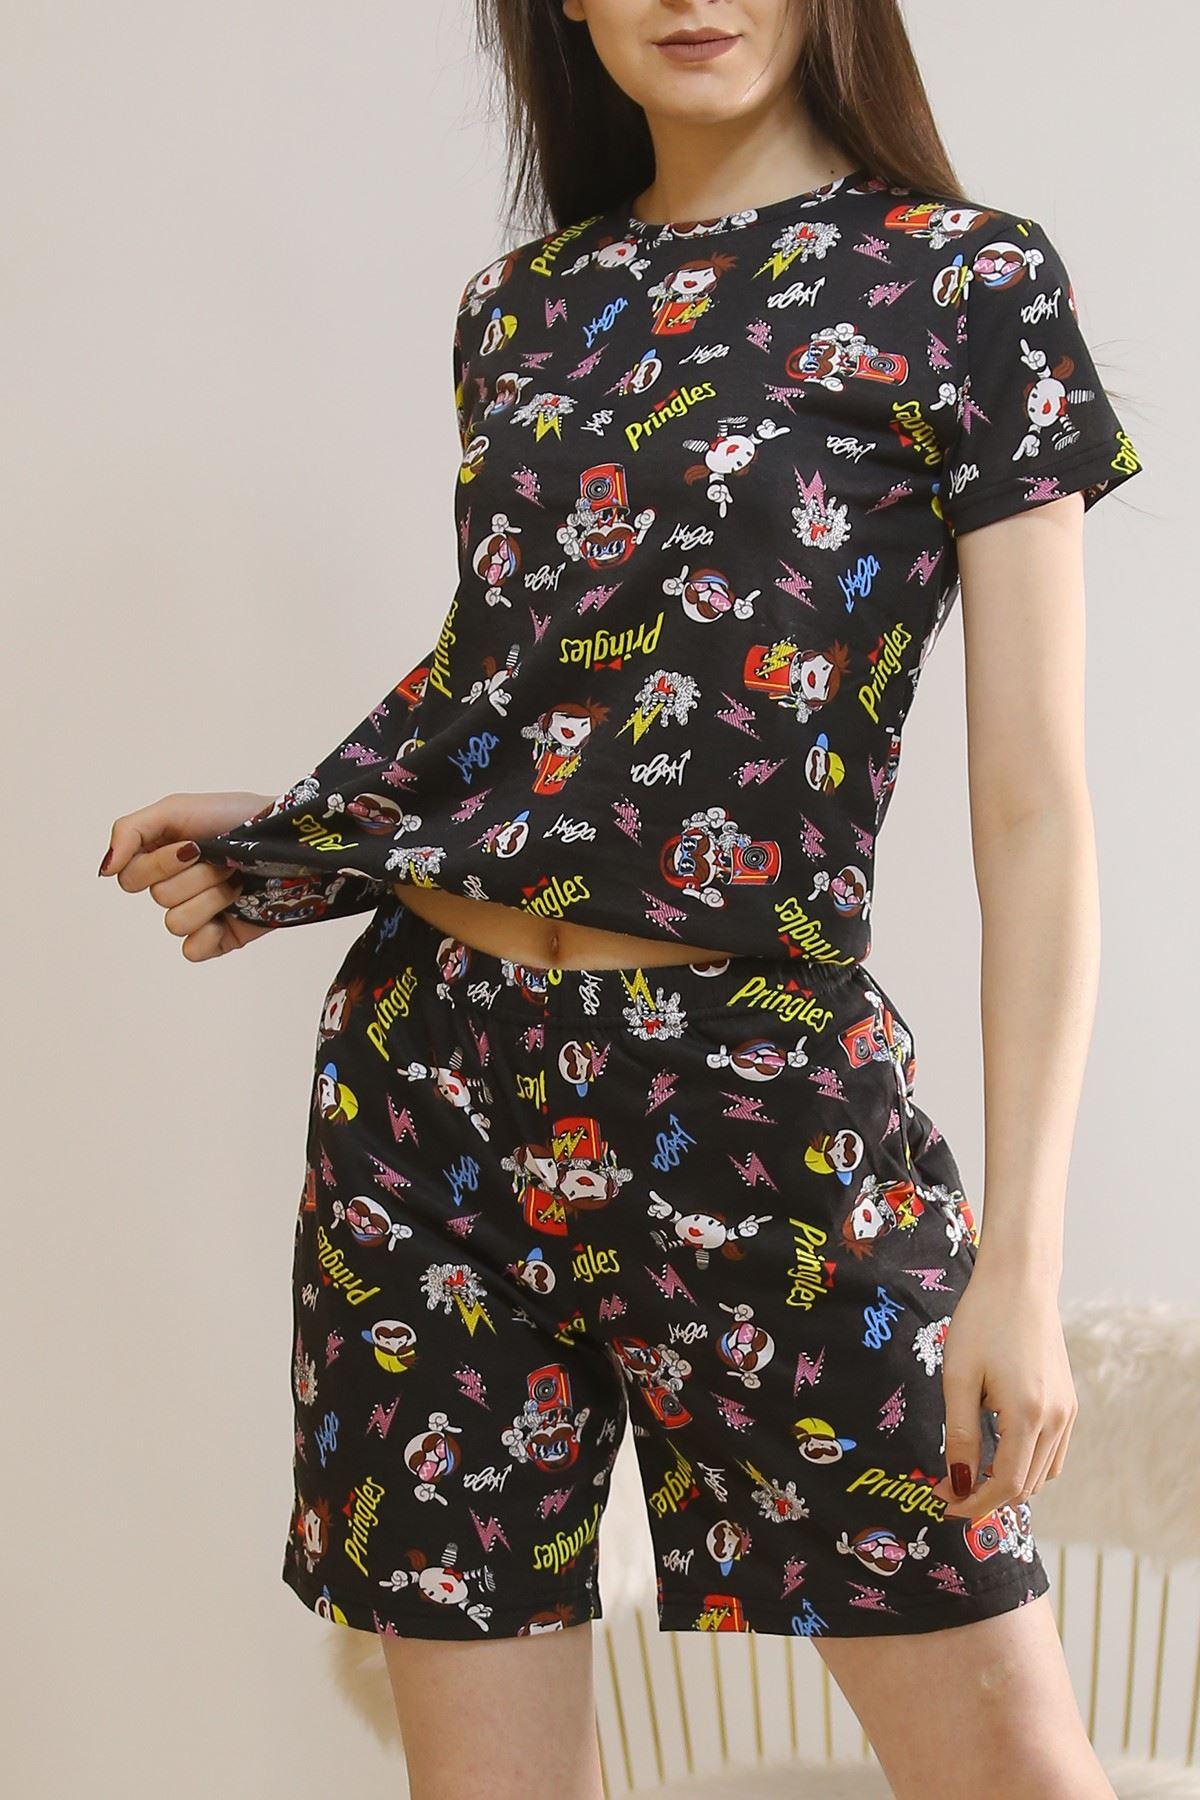 Şortlu Pijama Takımı Siyah - 5924.1059.